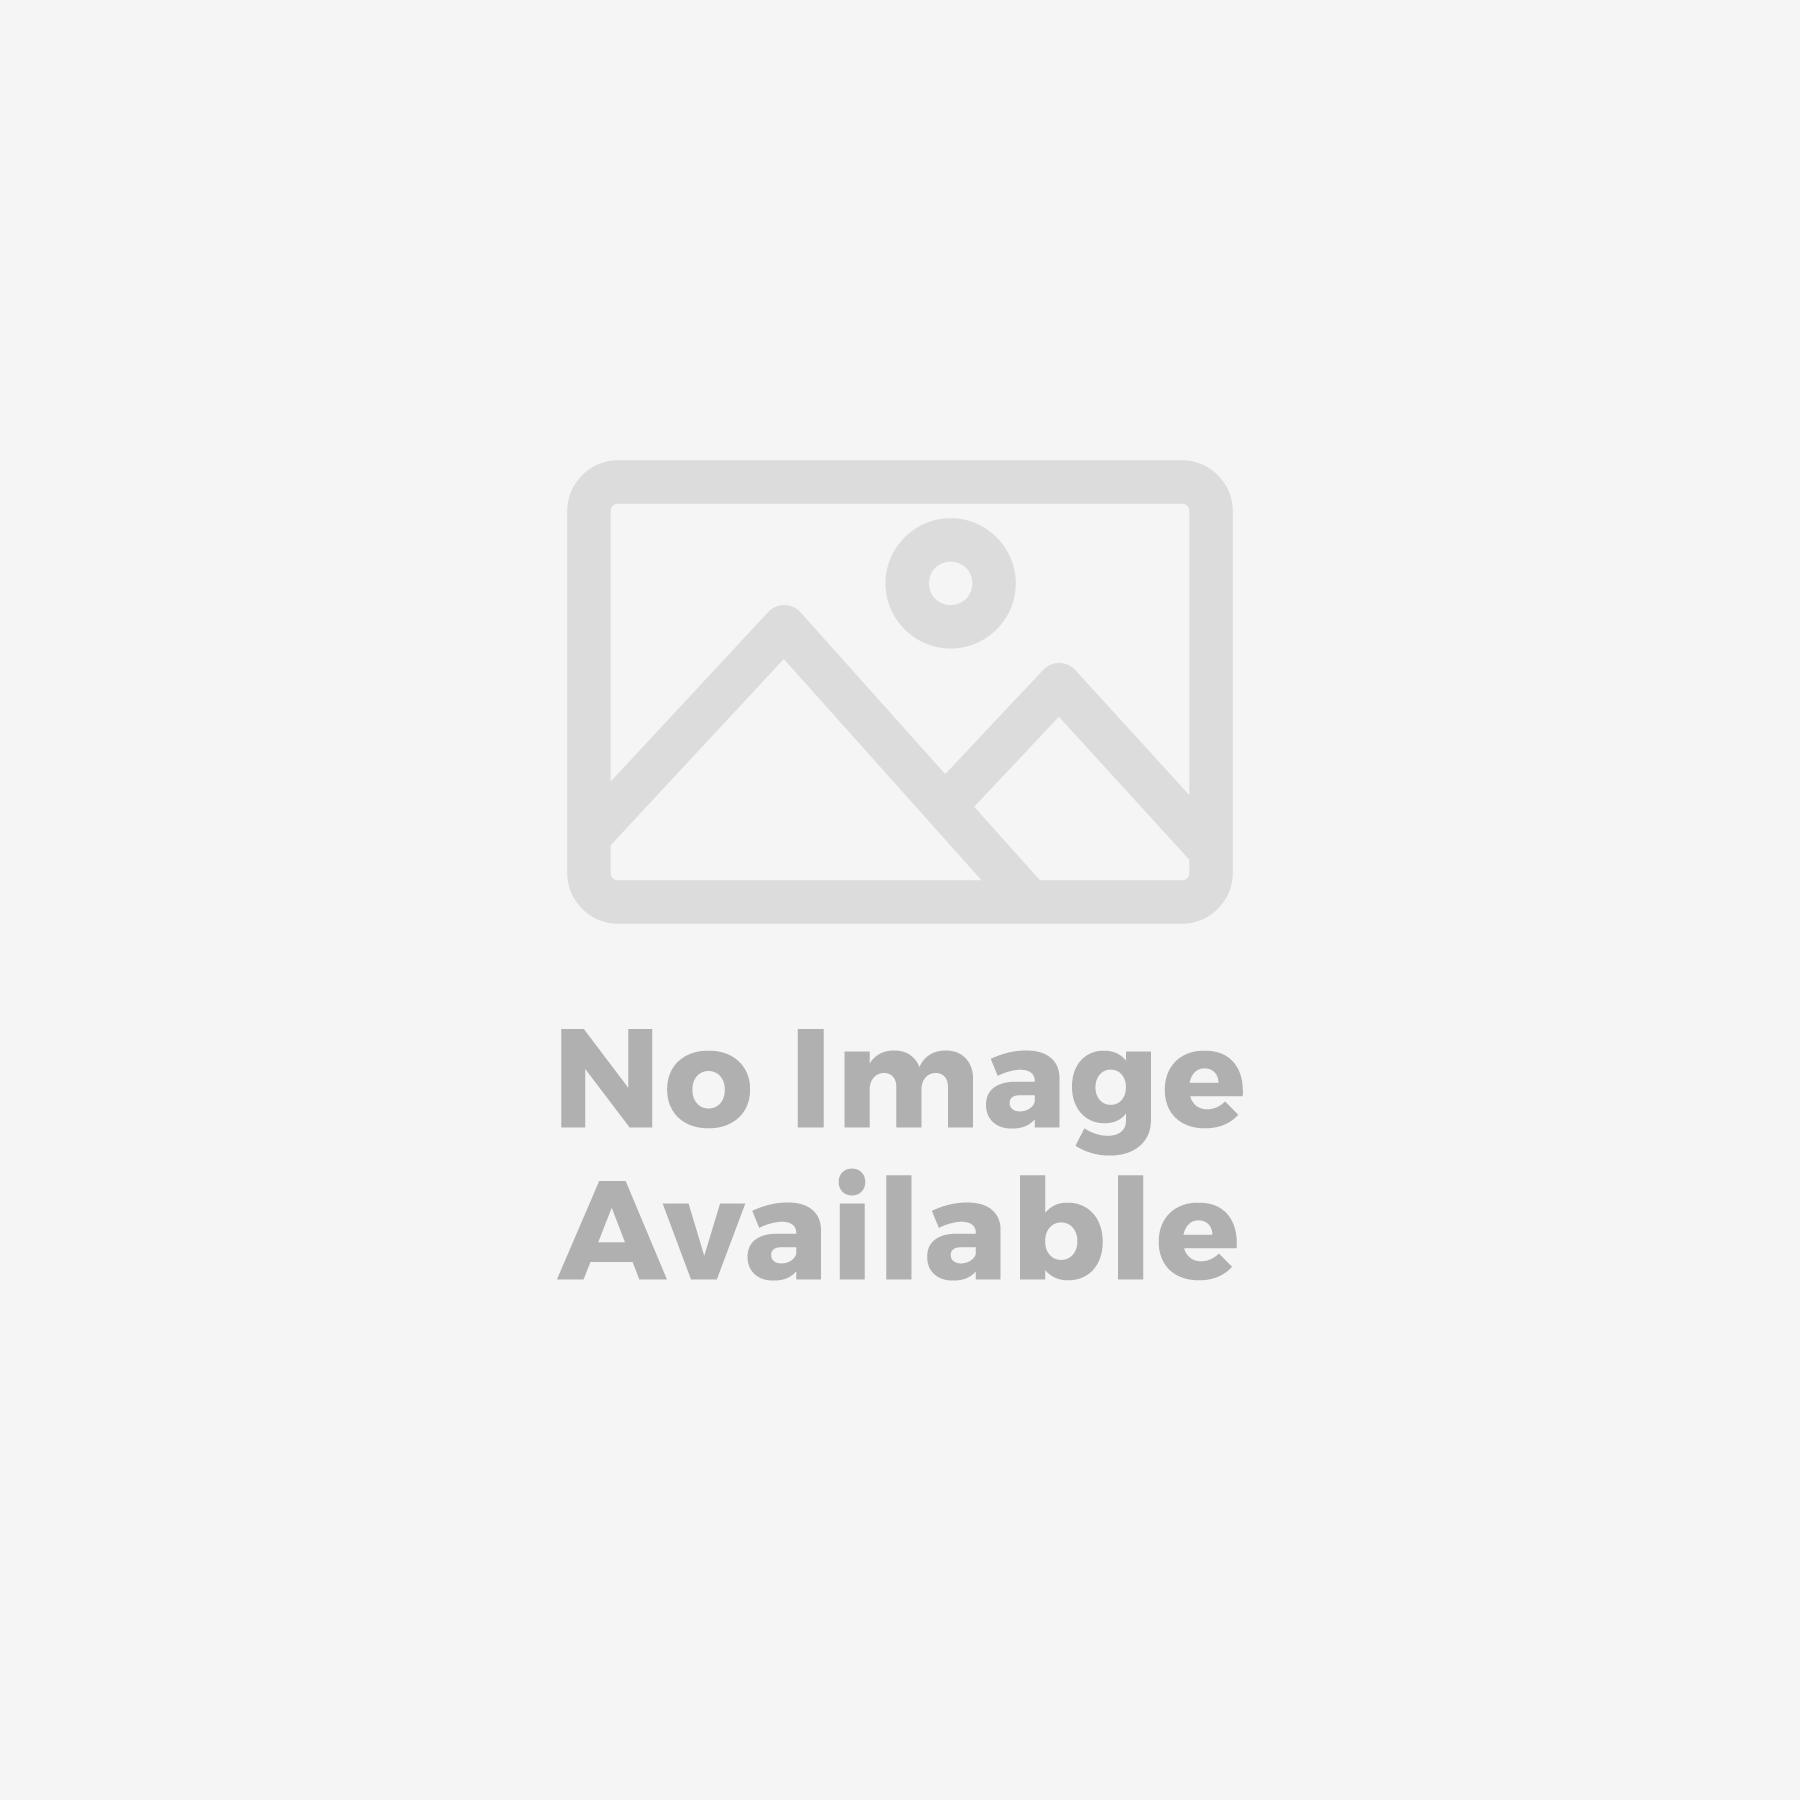 HERMES II - Fragment sculpture on a metal base